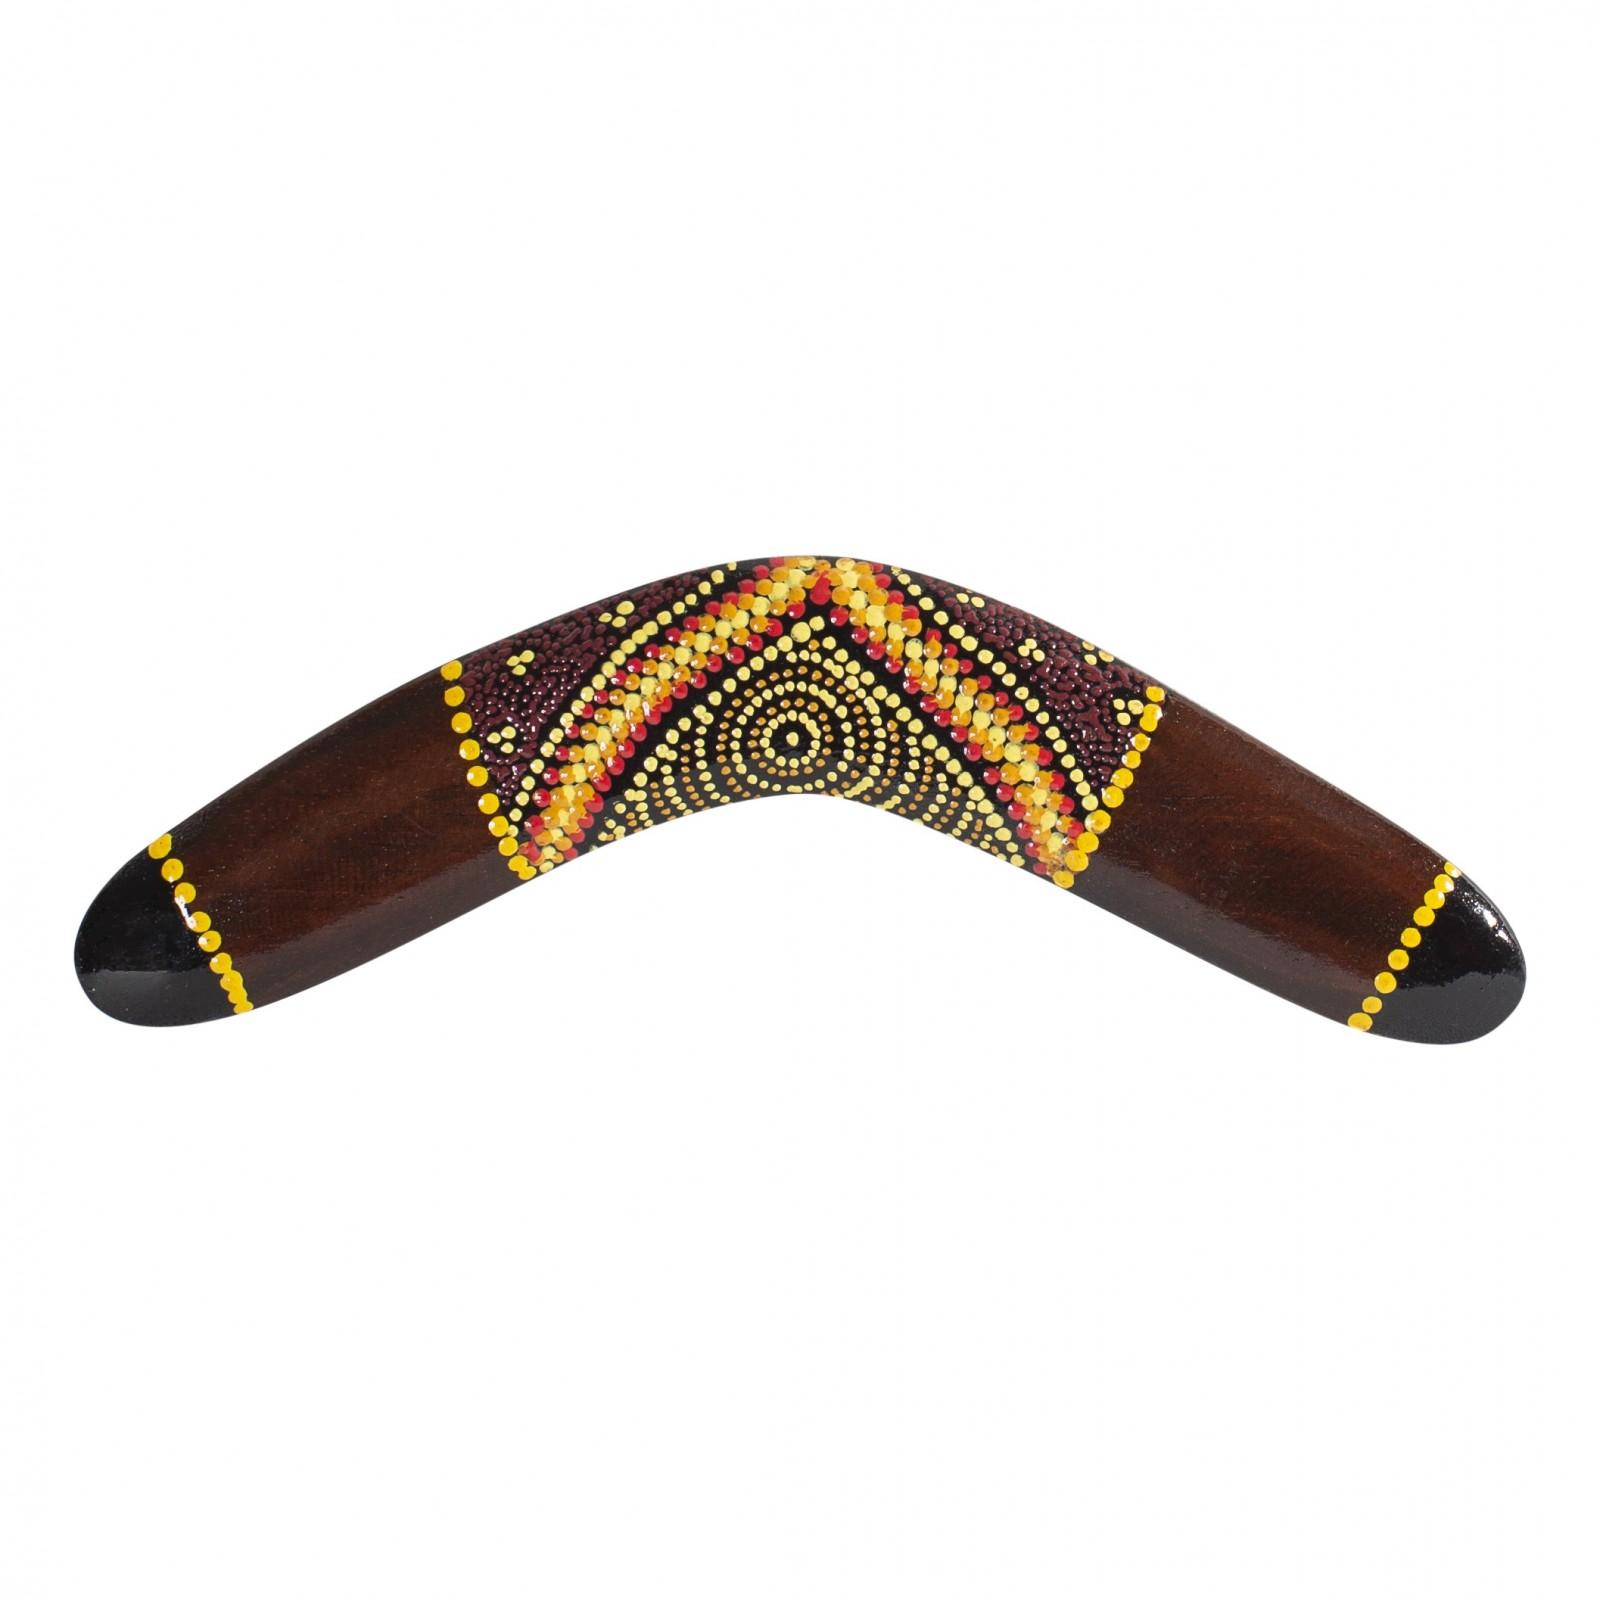 Australian Treasures Bumerang 30cm braun holz